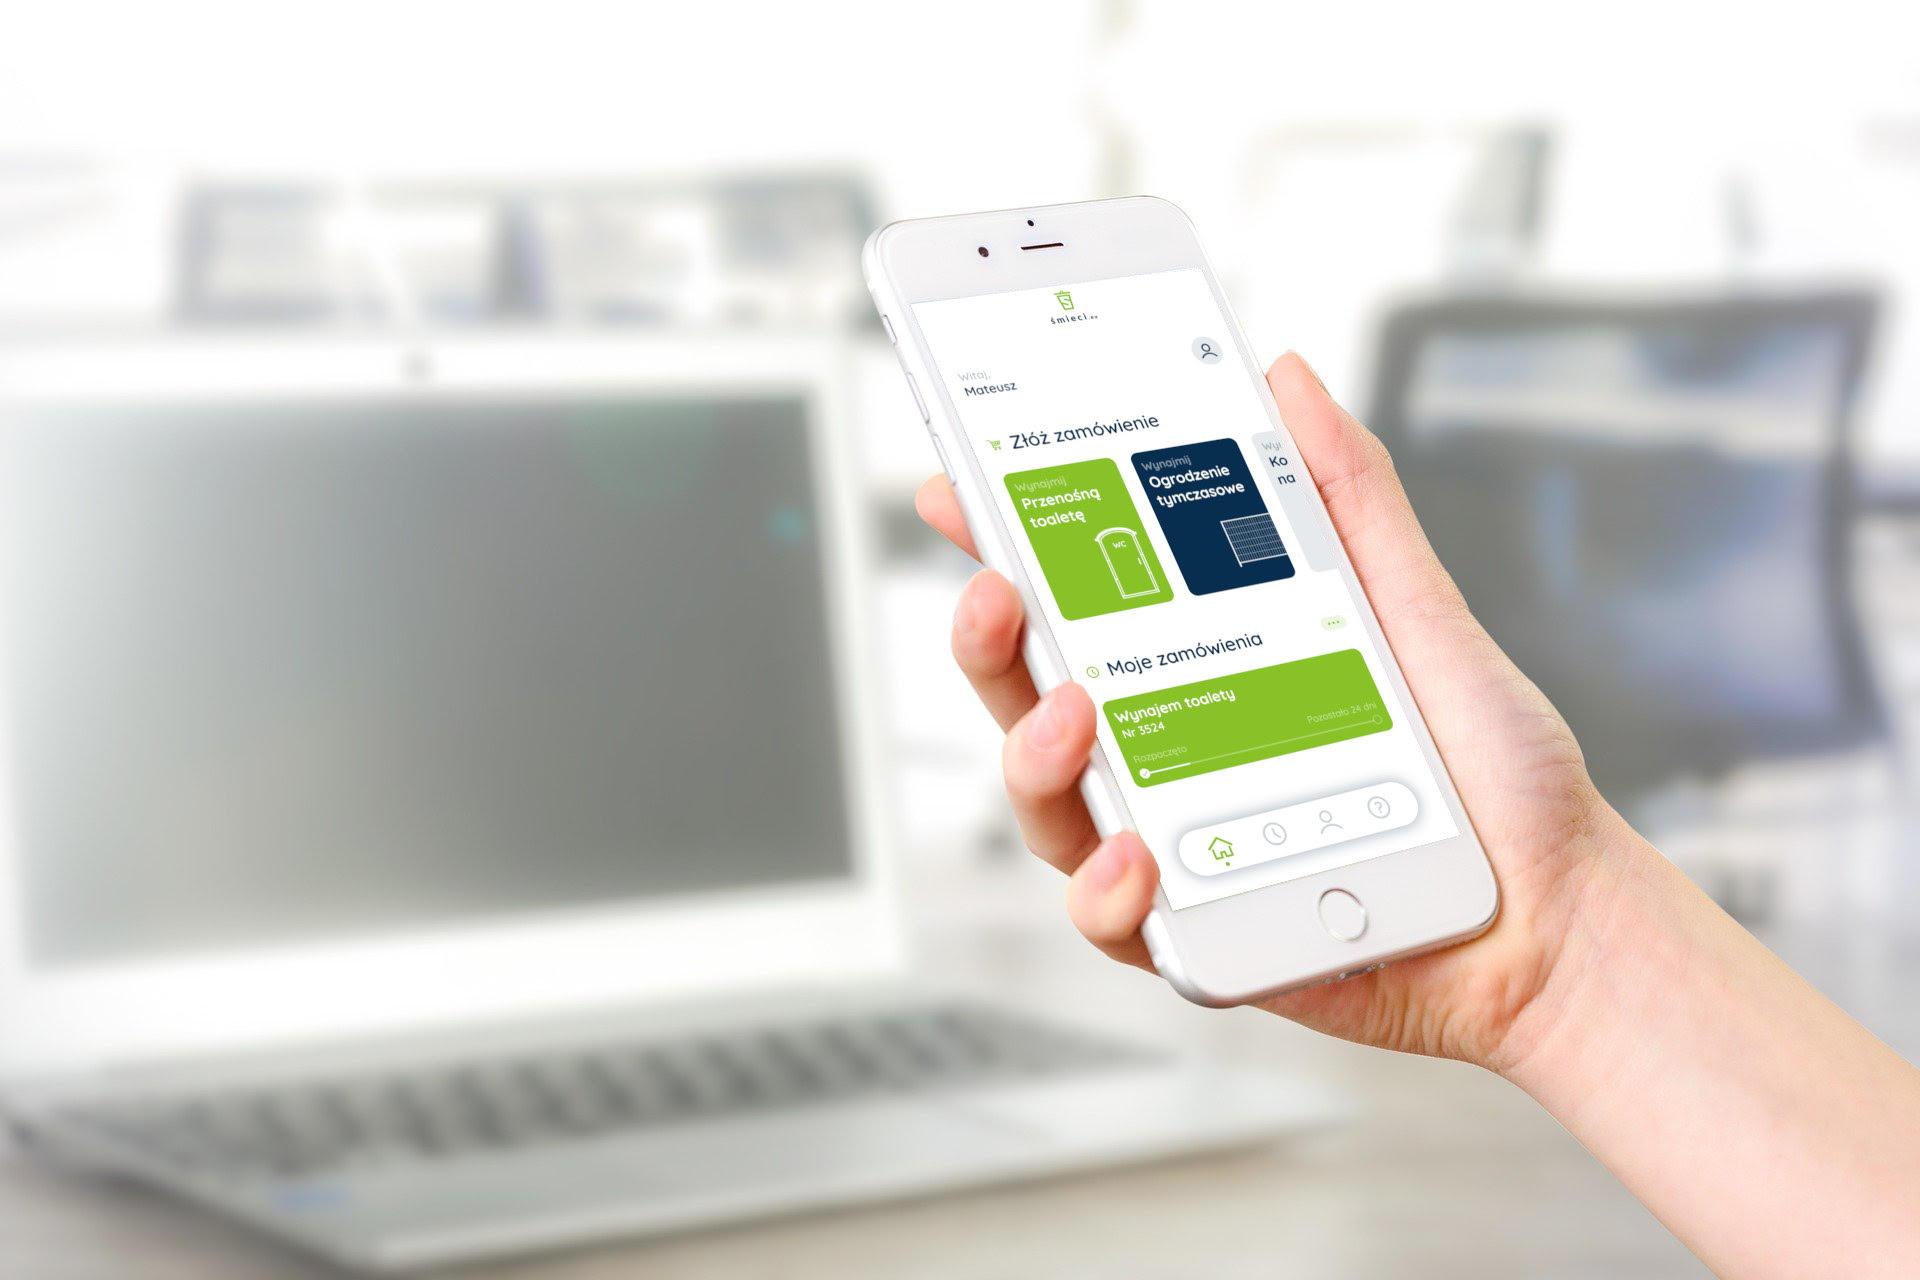 Aplikacja Śmieci.eu na Androida i IOS